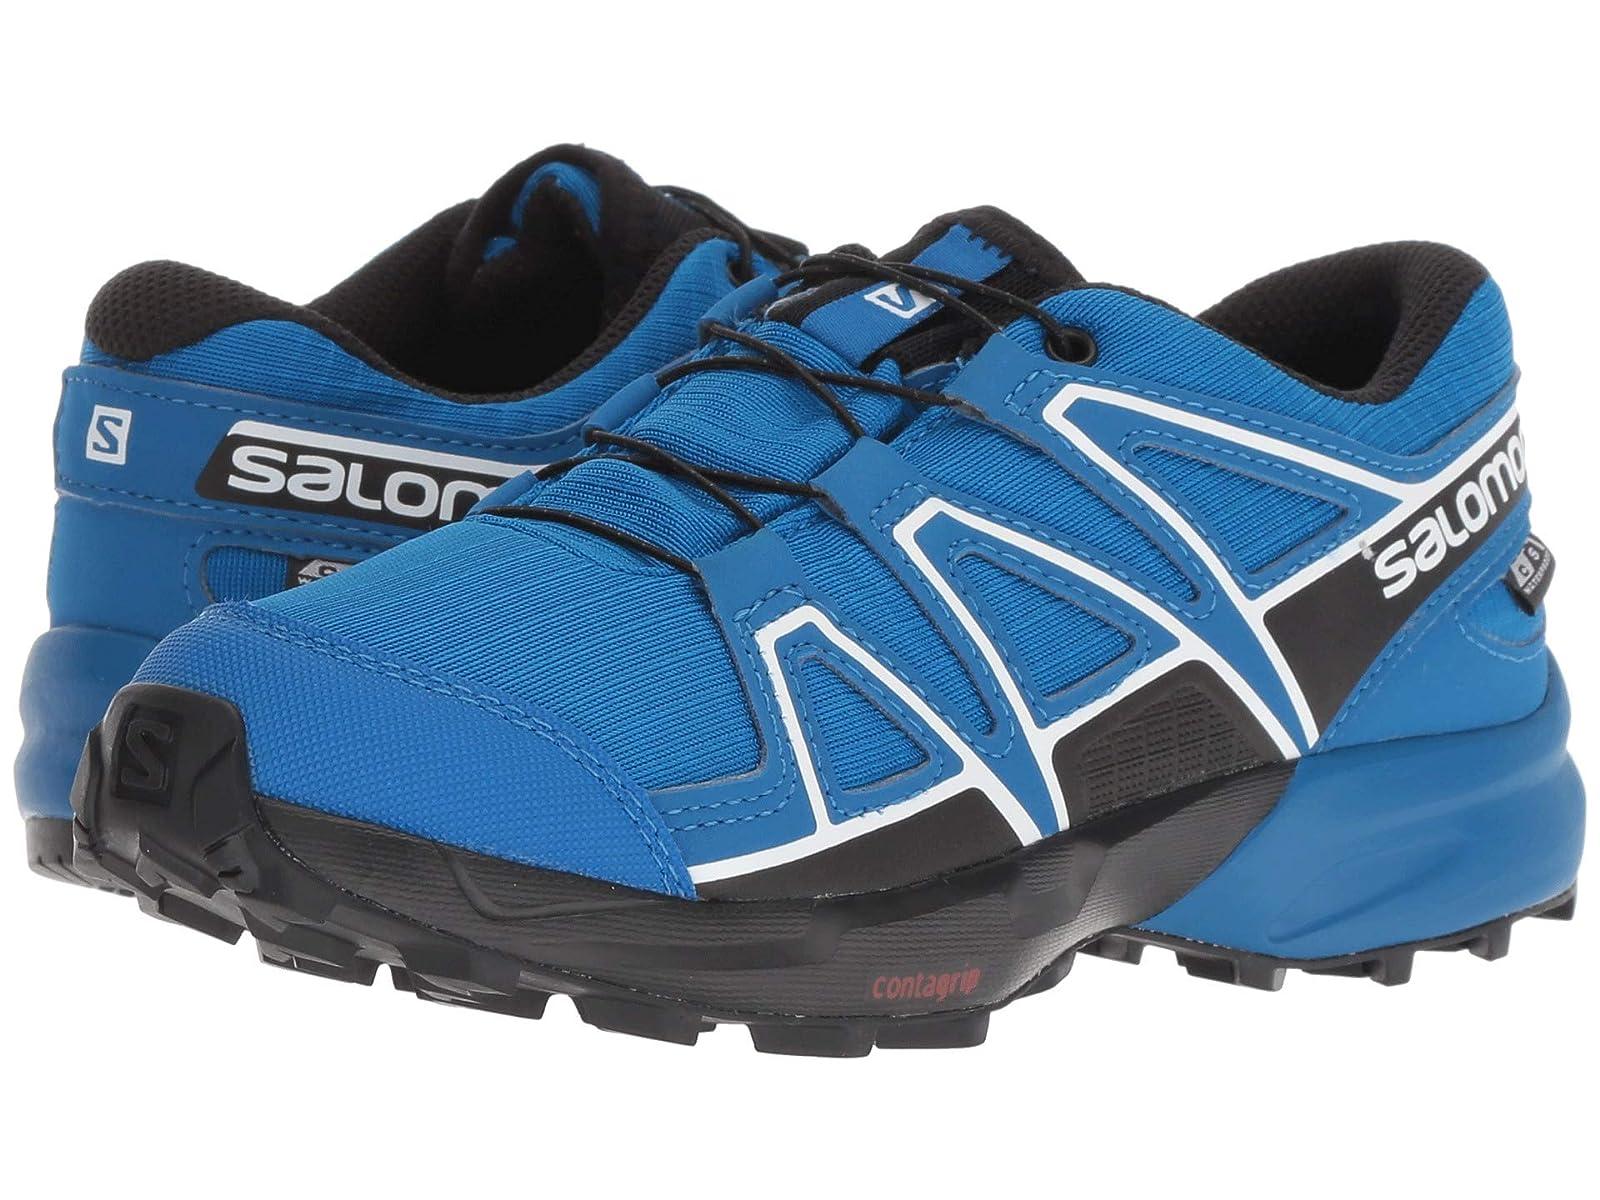 Salomon Kids Speedcross CSWP (Little Kid/Big Kid)Atmospheric grades have affordable shoes